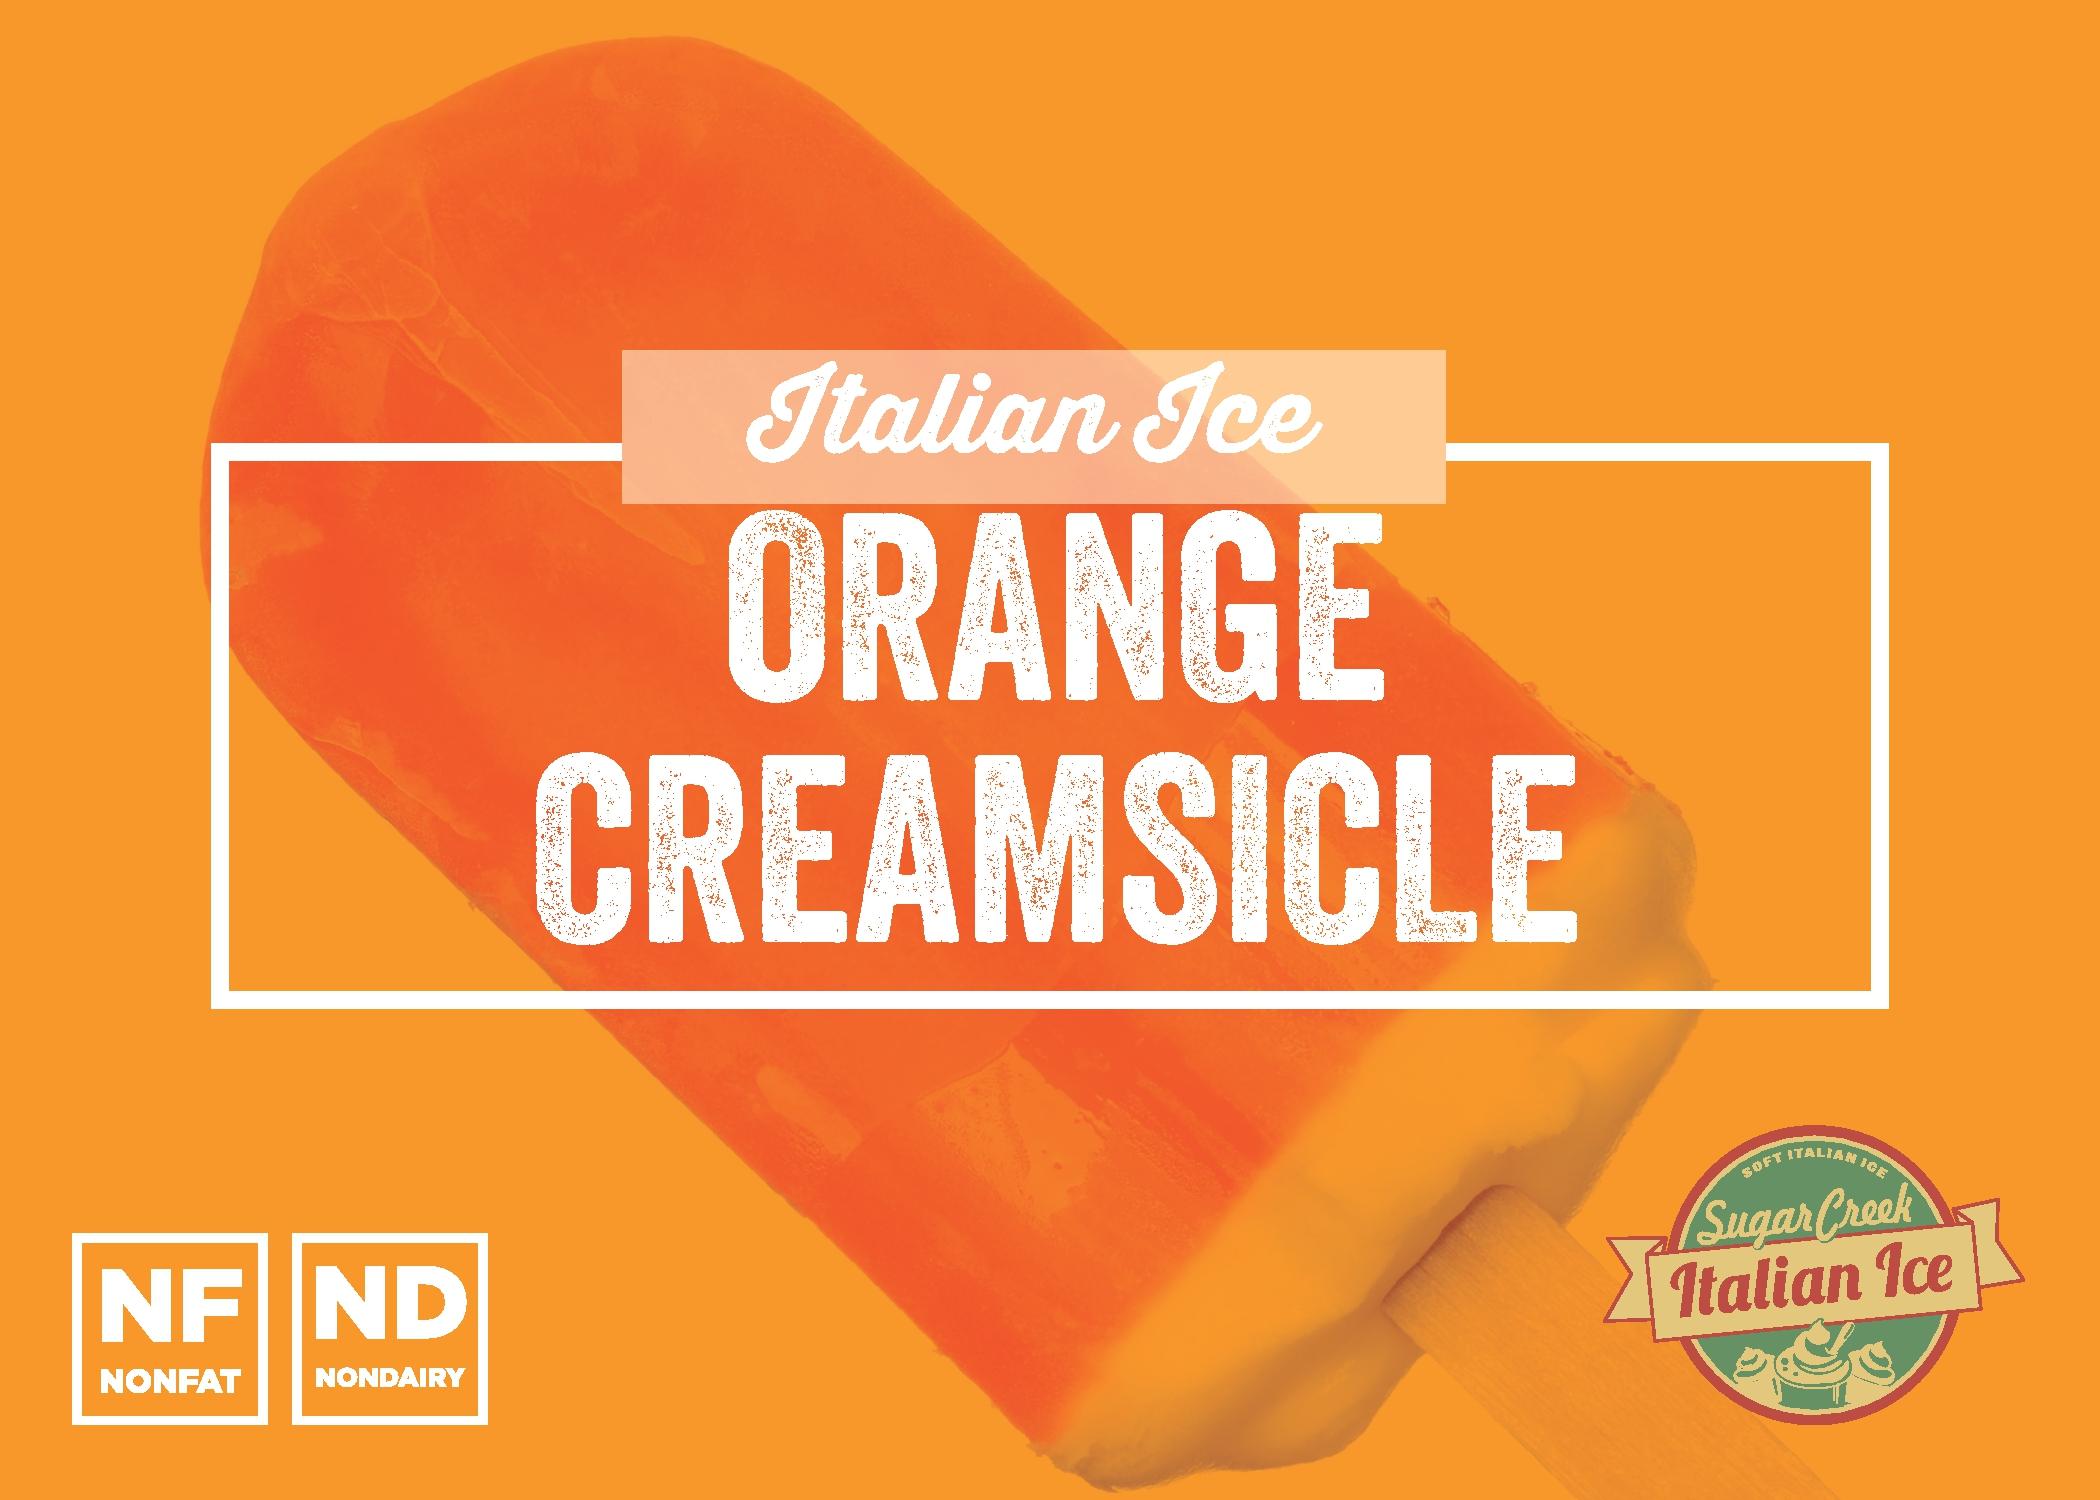 Orange Creamsicle Italian Ice